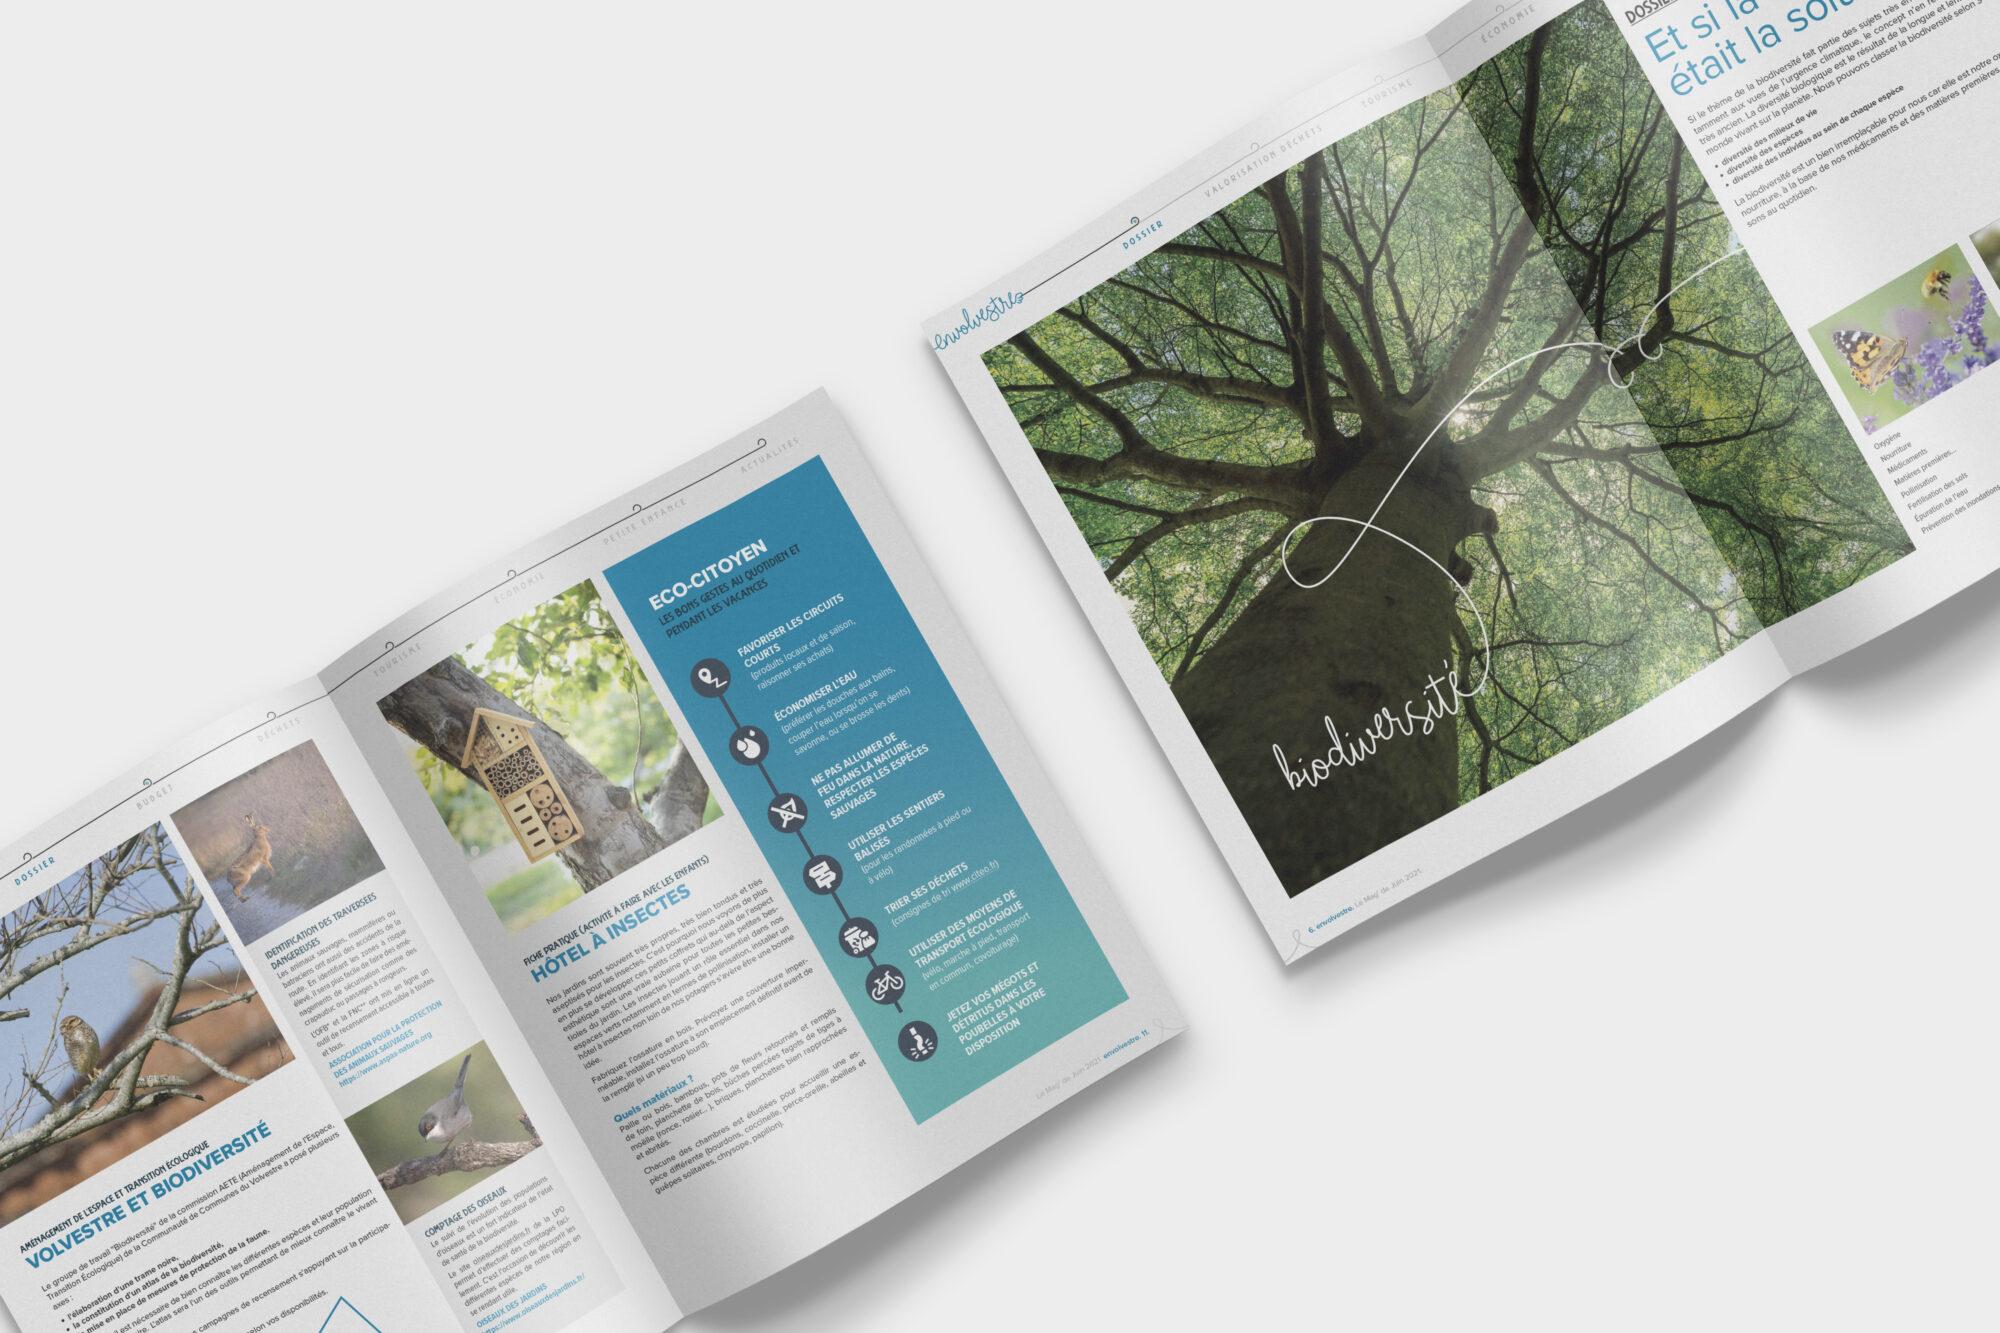 mockup enVolvestre#2 – 36 pages int